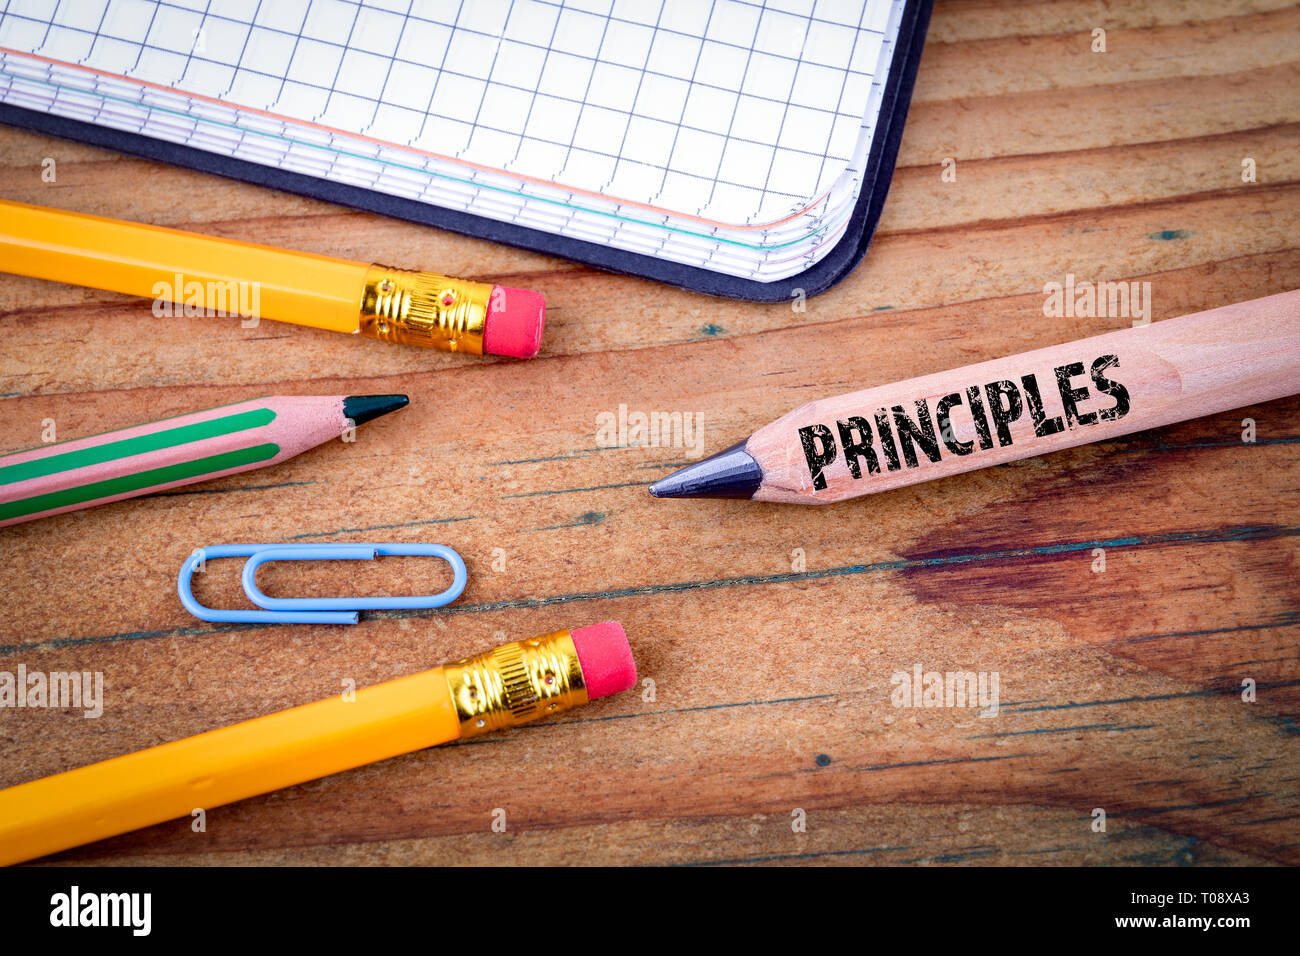 PRINCIPLES text on pencil - Stock Image